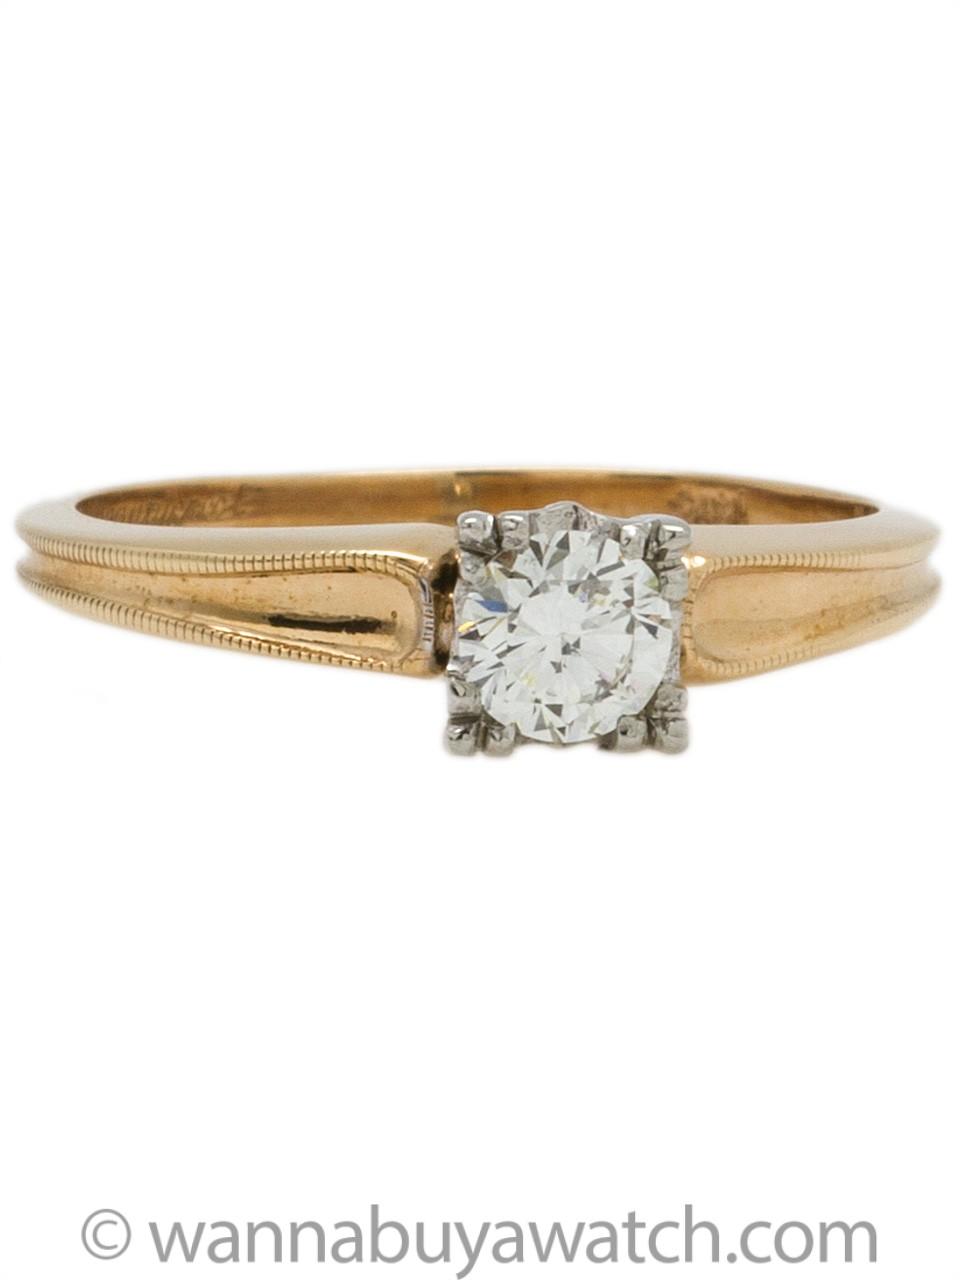 Classic 14K Diamond Solitaire Engagement Ring 0.36ct J-VS1 circa 1950s